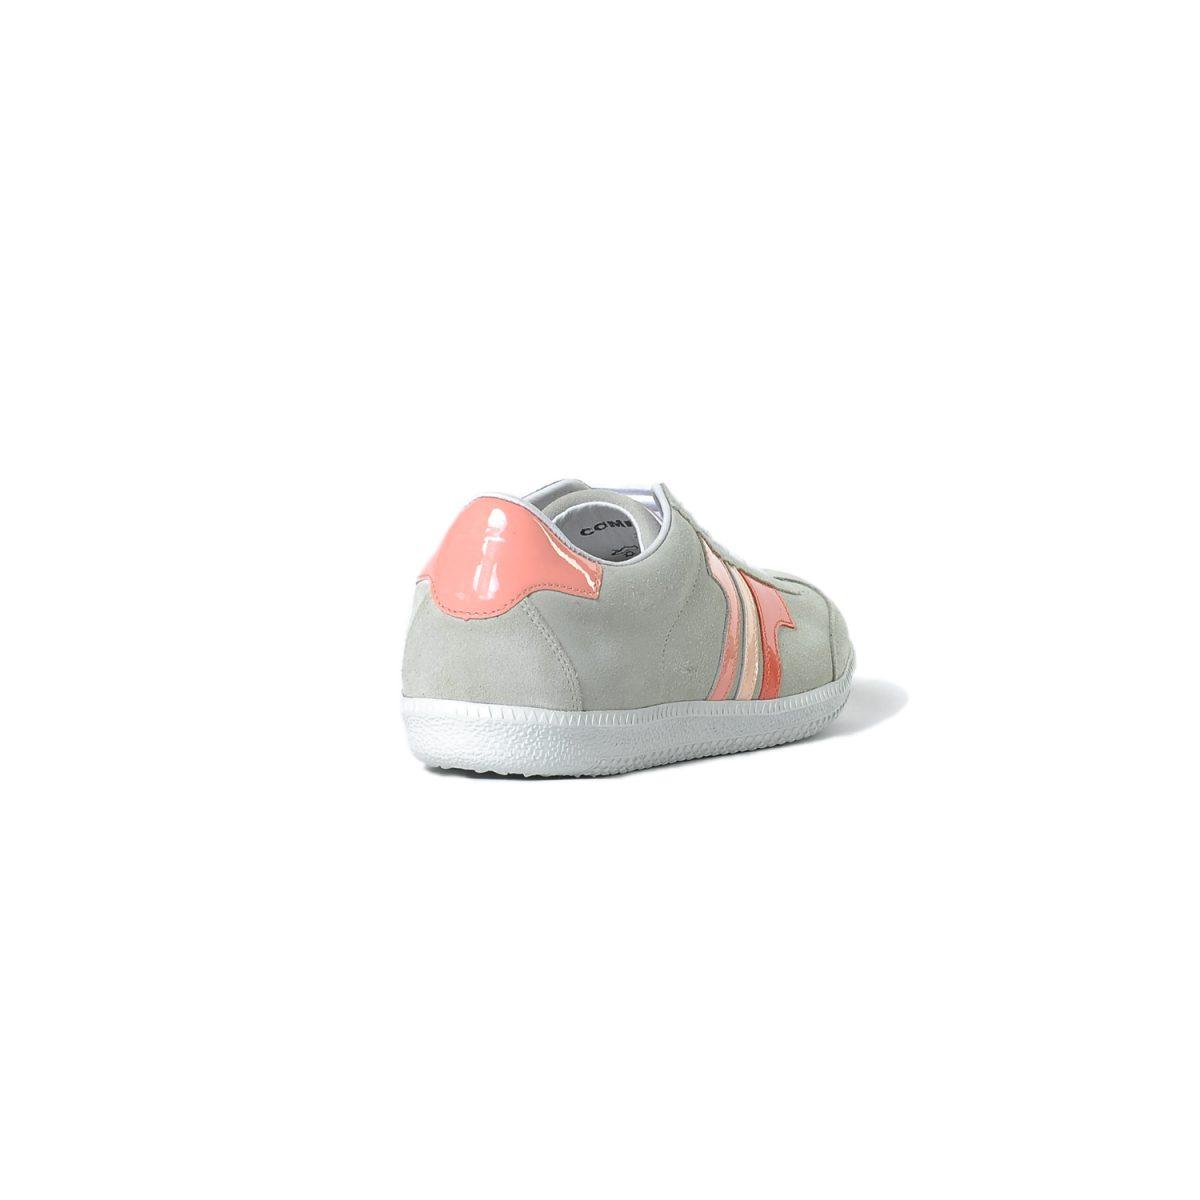 Tisza shoes - Comfort - Off white-neon